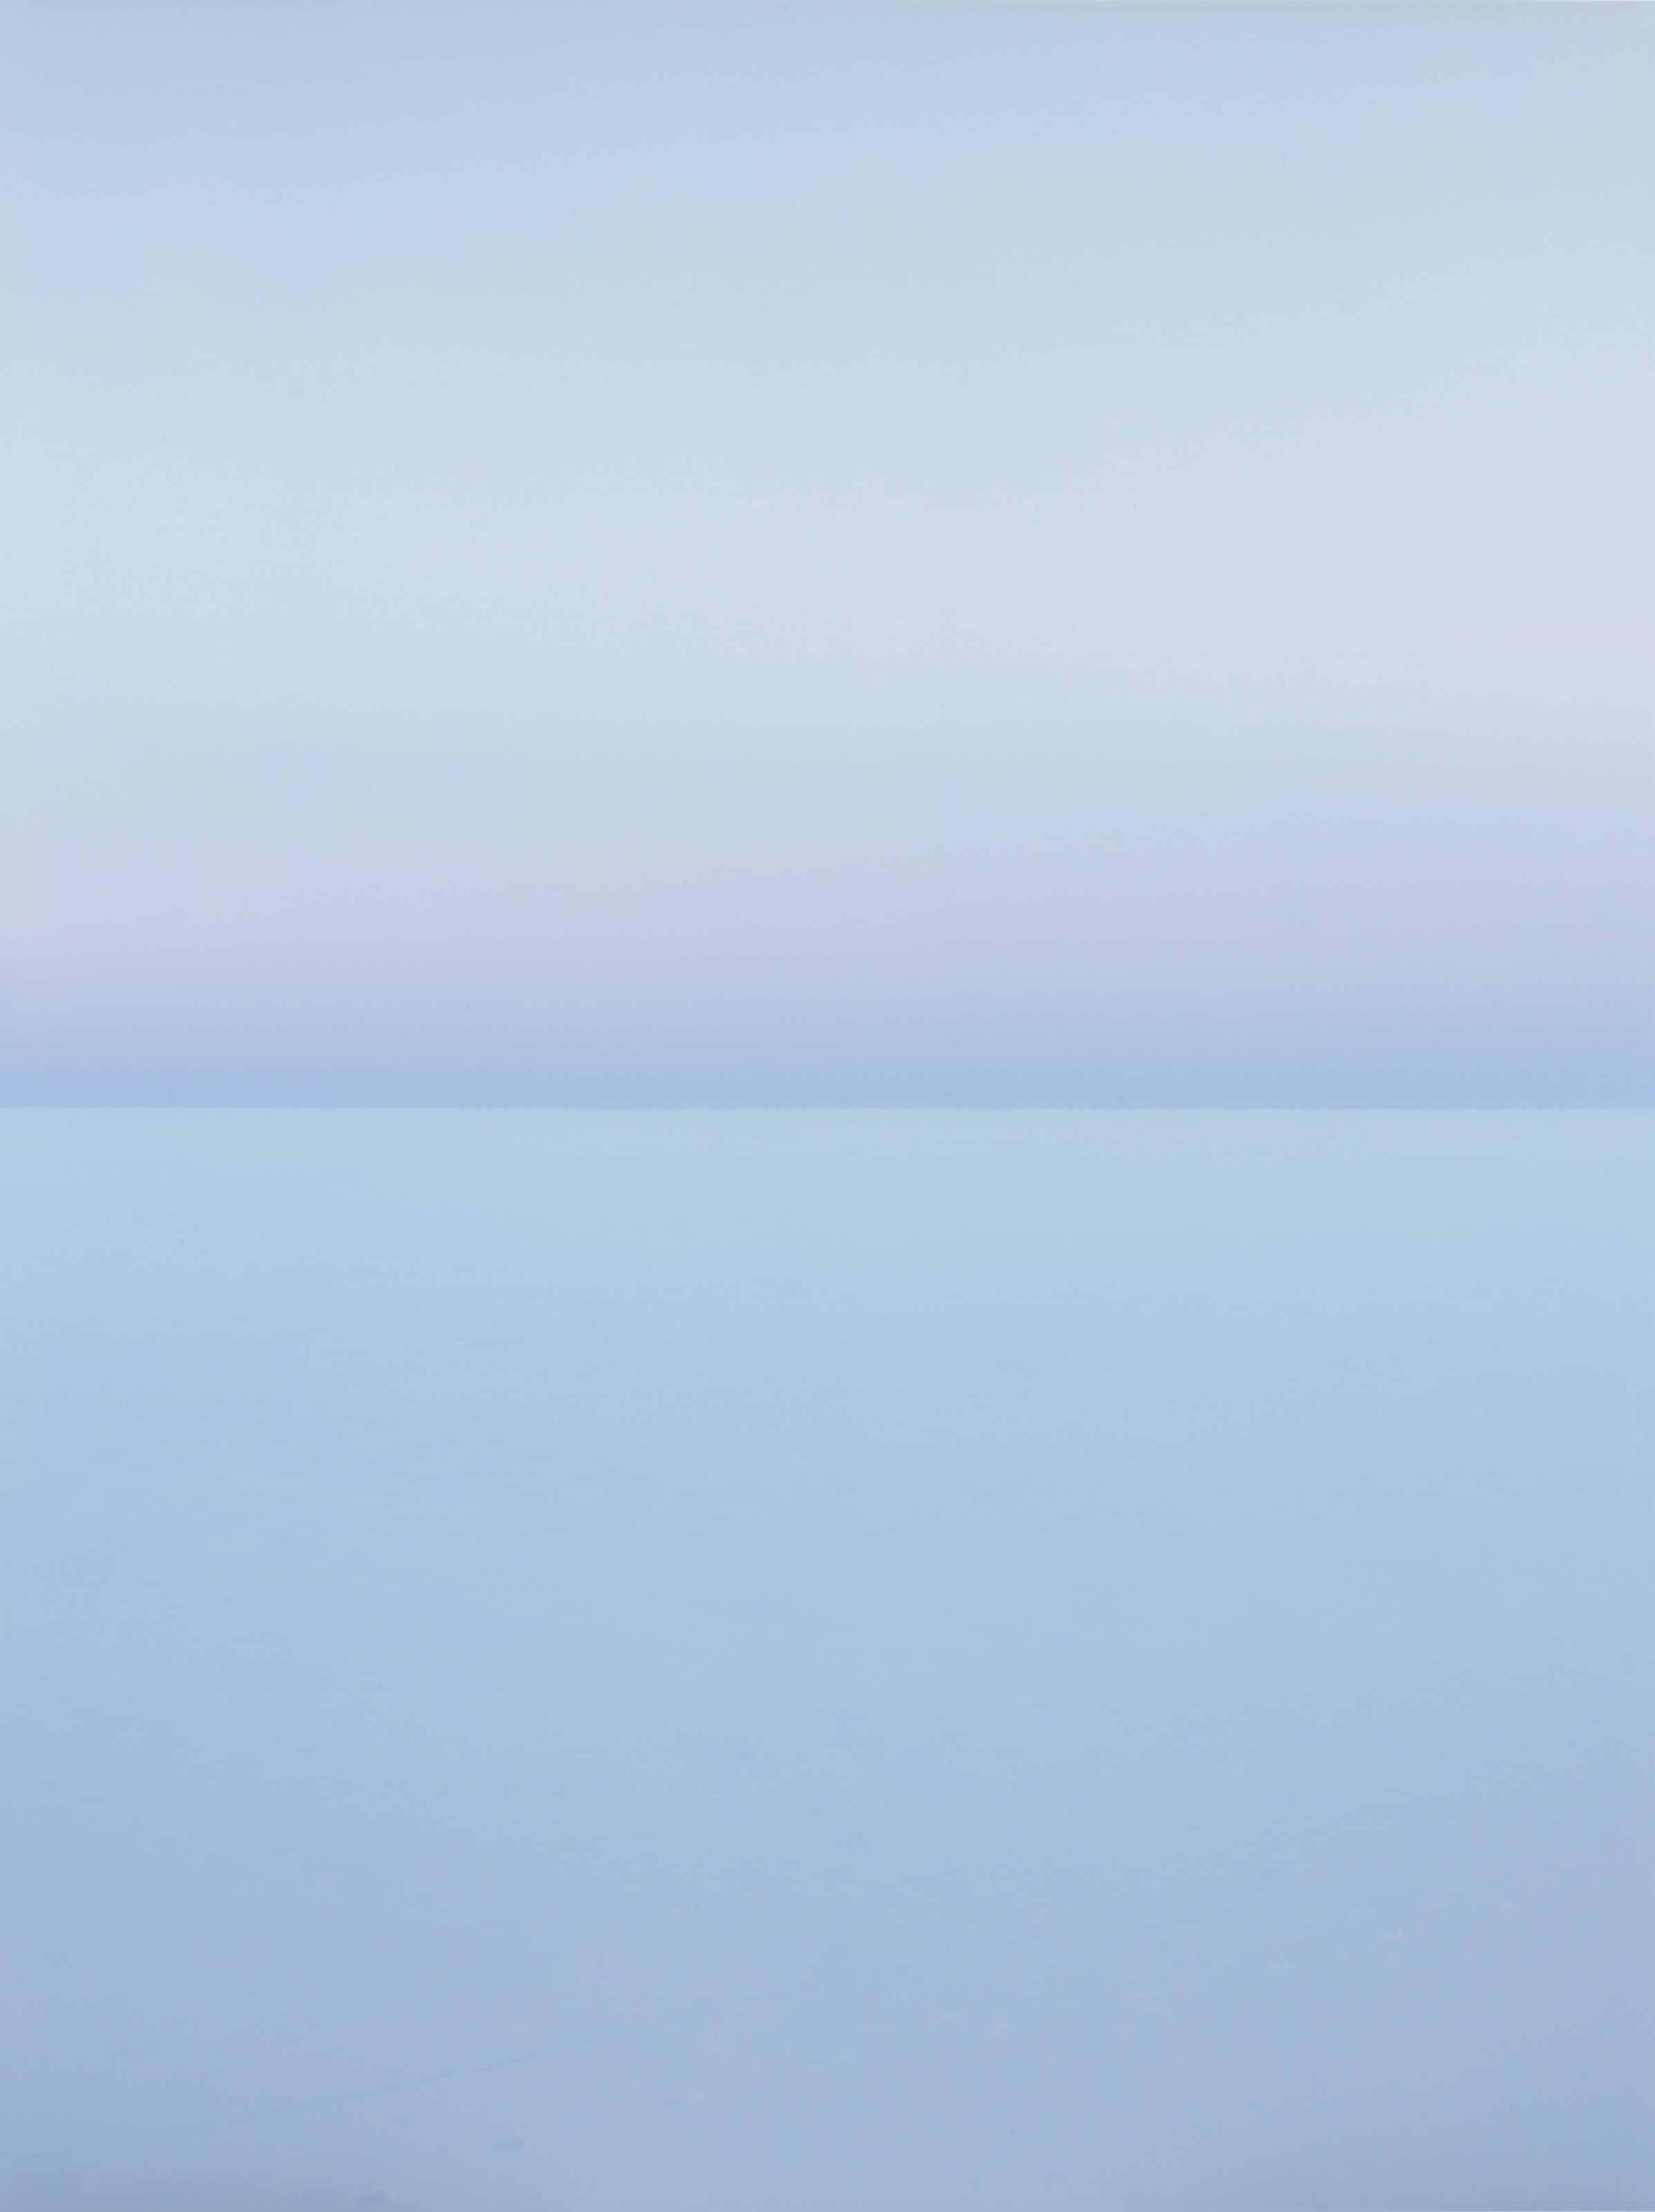 Untitled #8, 2011